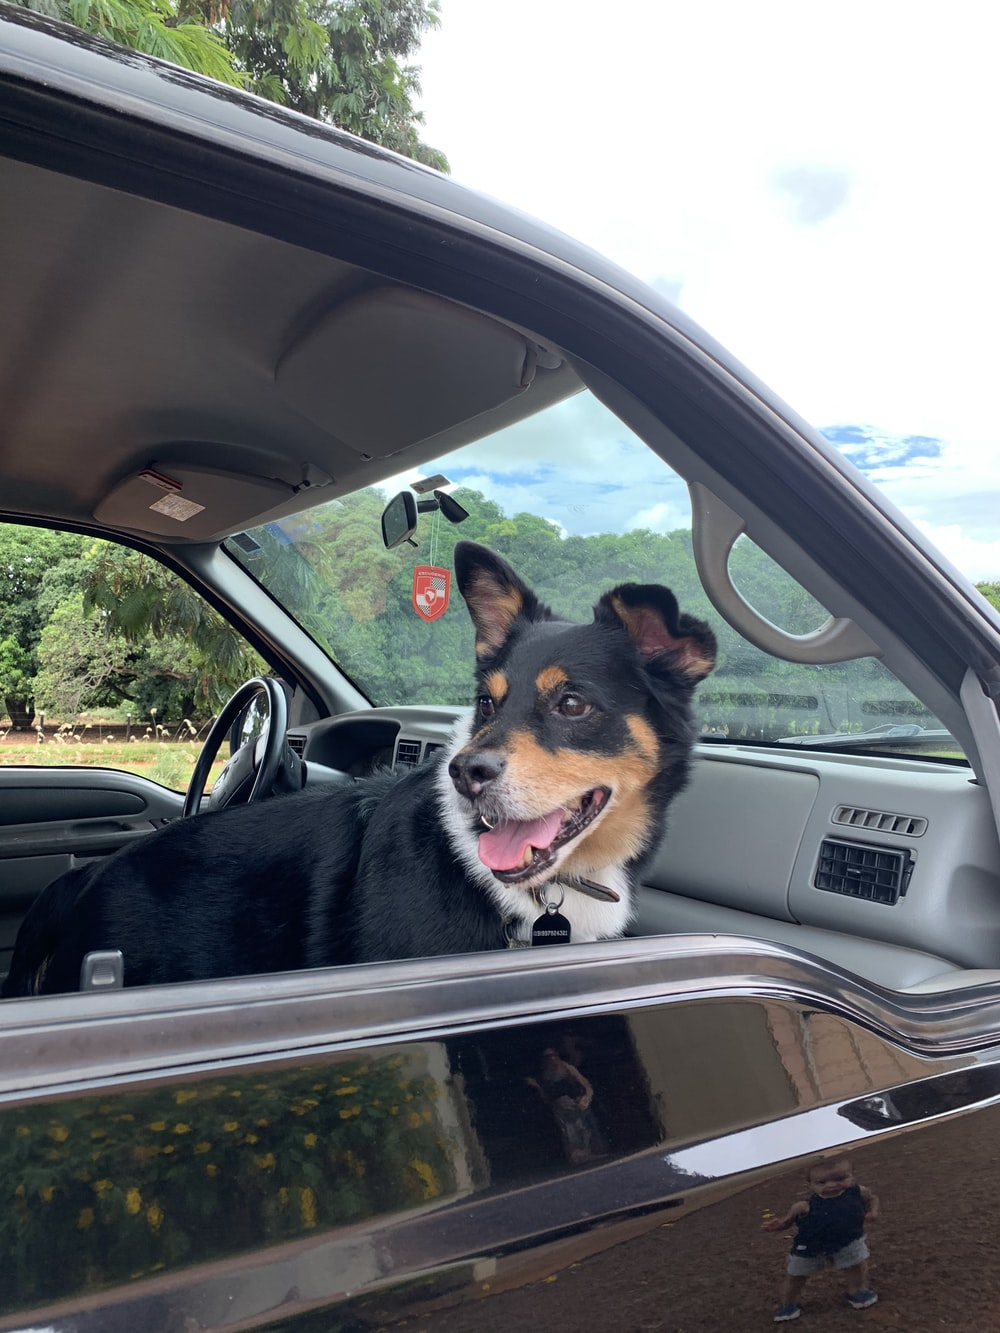 black and brown short coated dog inside car during daytime